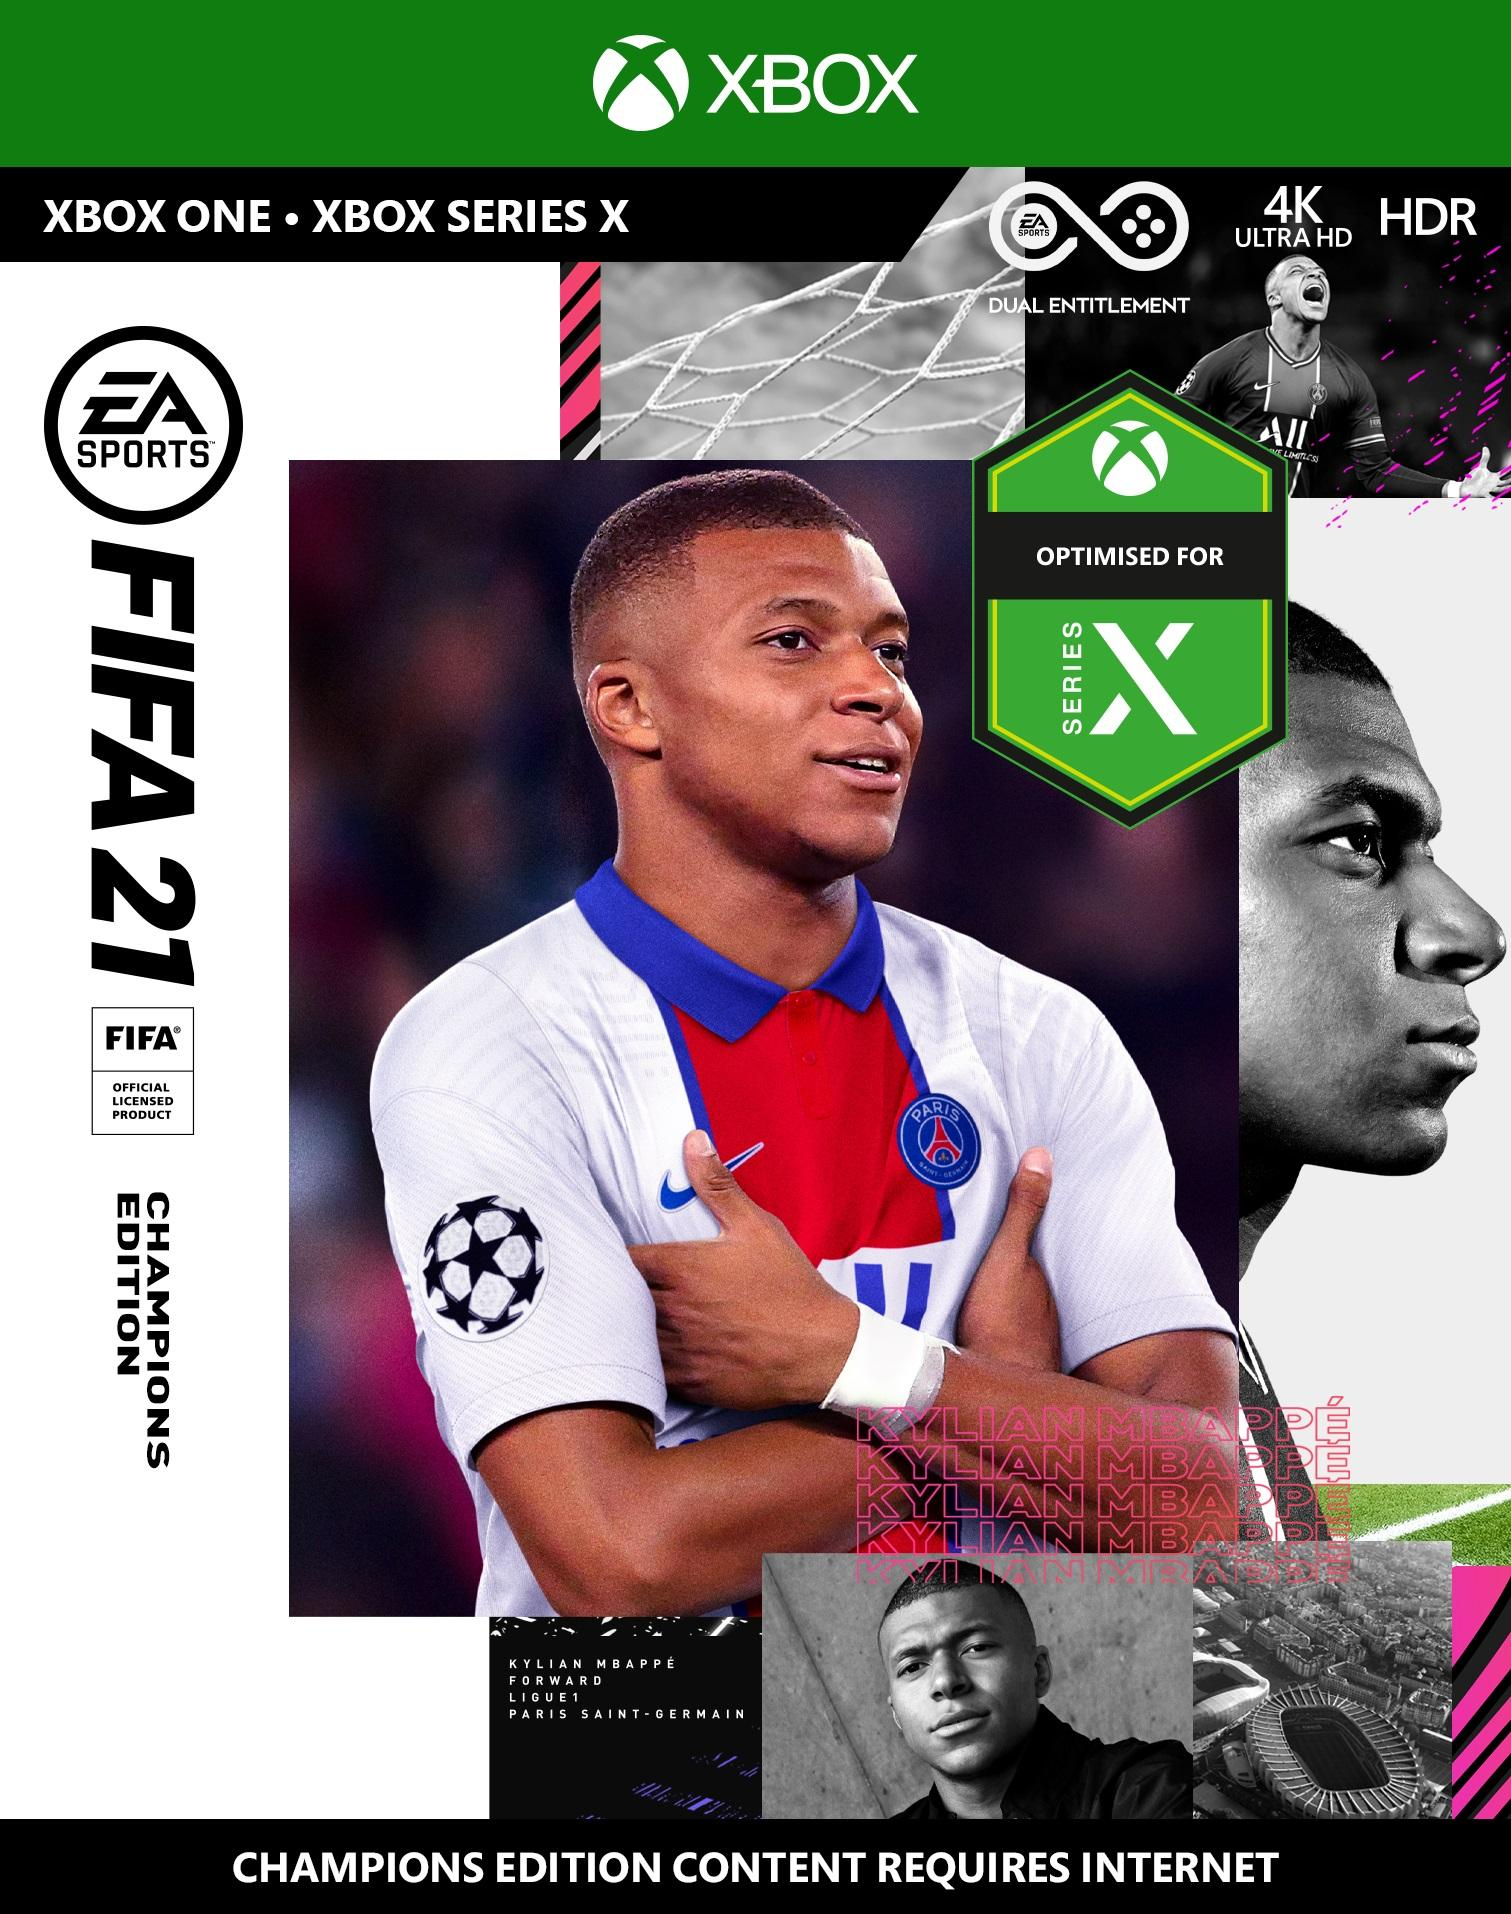 fifa21-cover-full-chp-x.jpg